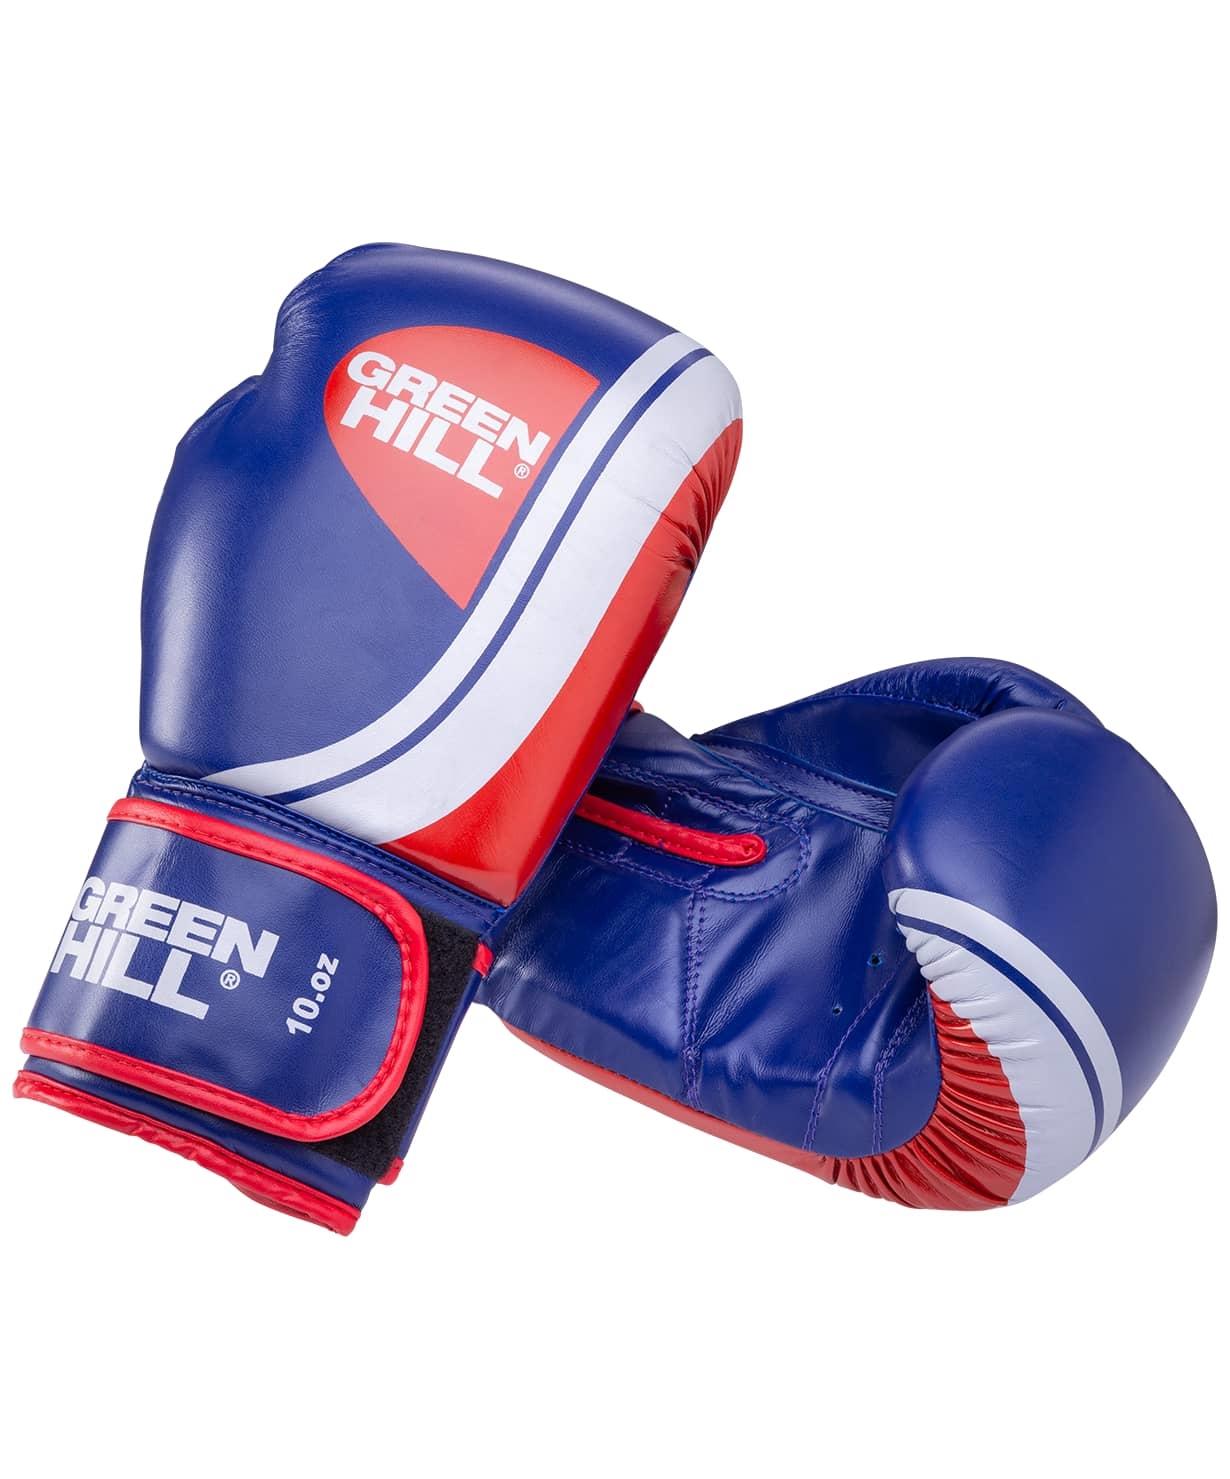 Перчатки боксерские Knockout BGK-2266, 12 oz, к/з, синий